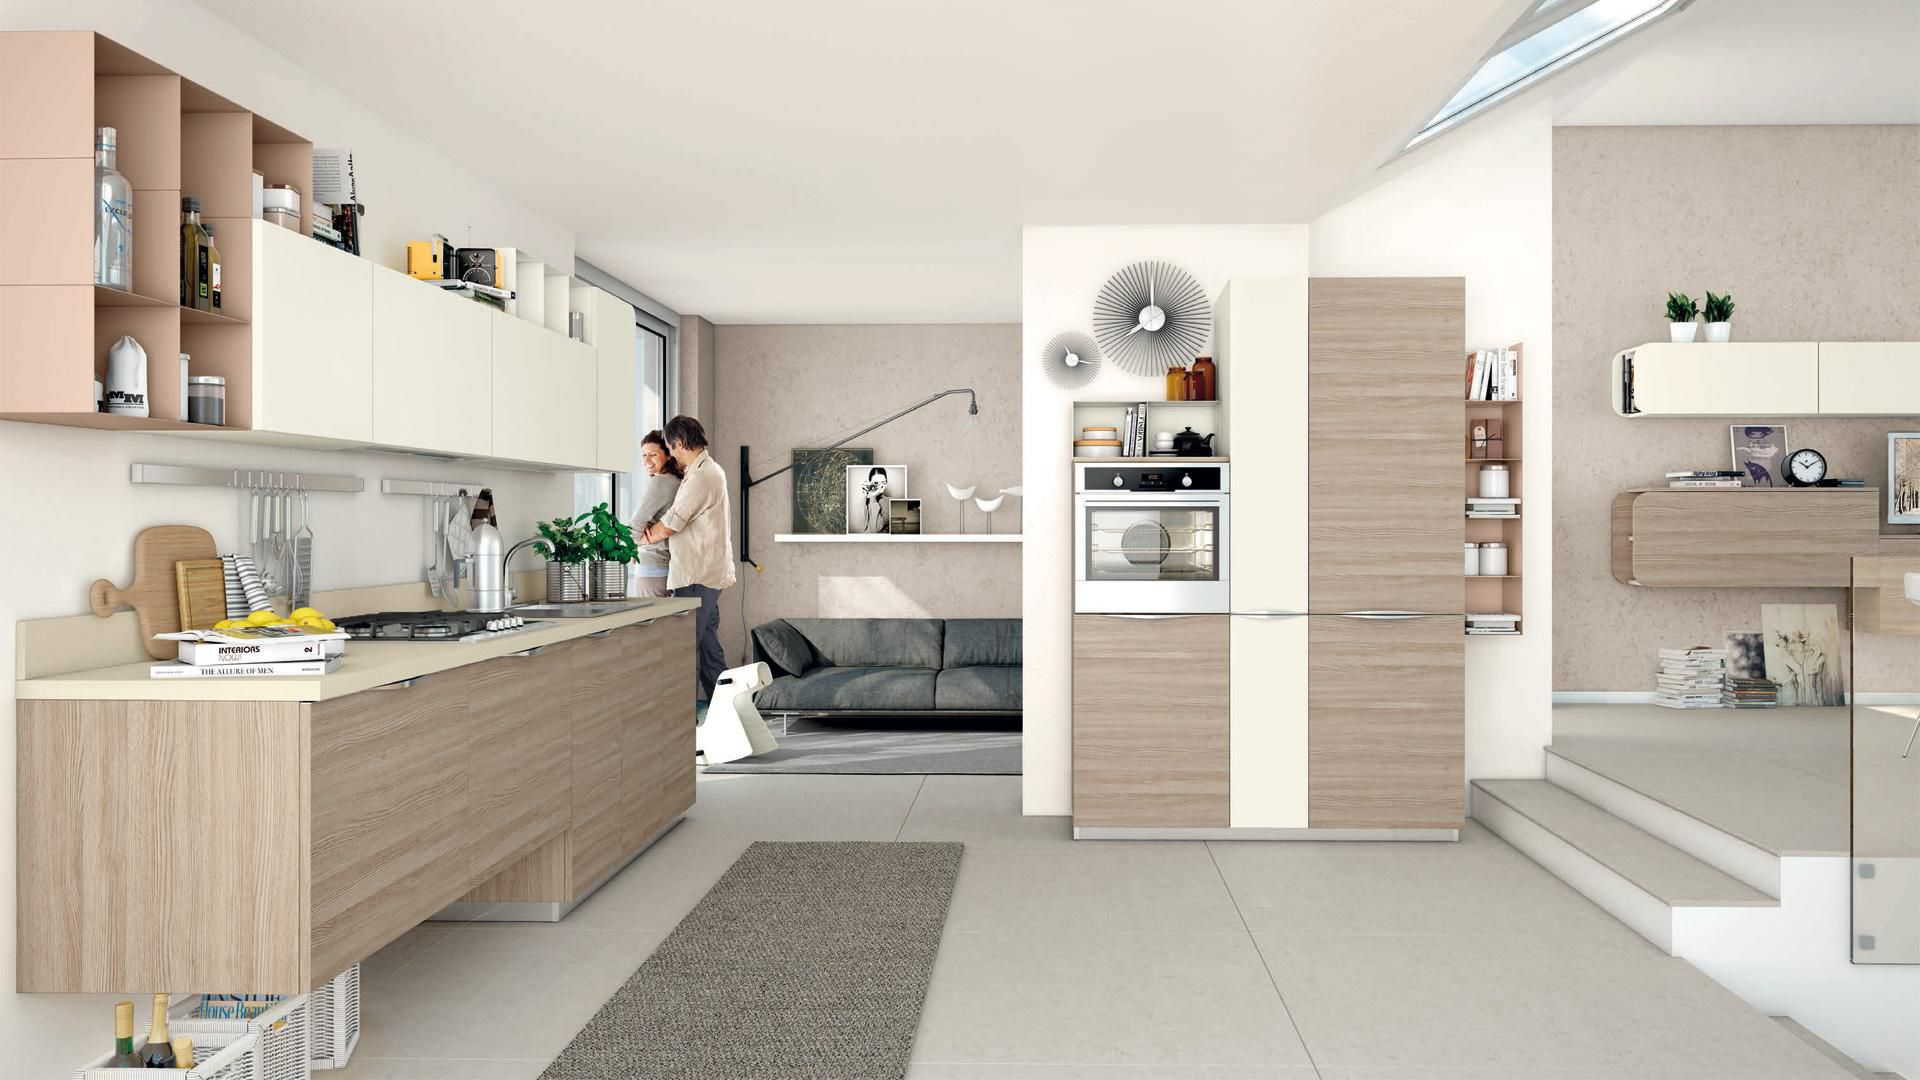 Cucina moderna / impiallacciata in legno - IMMAGINA - CUCINE LUBE ...